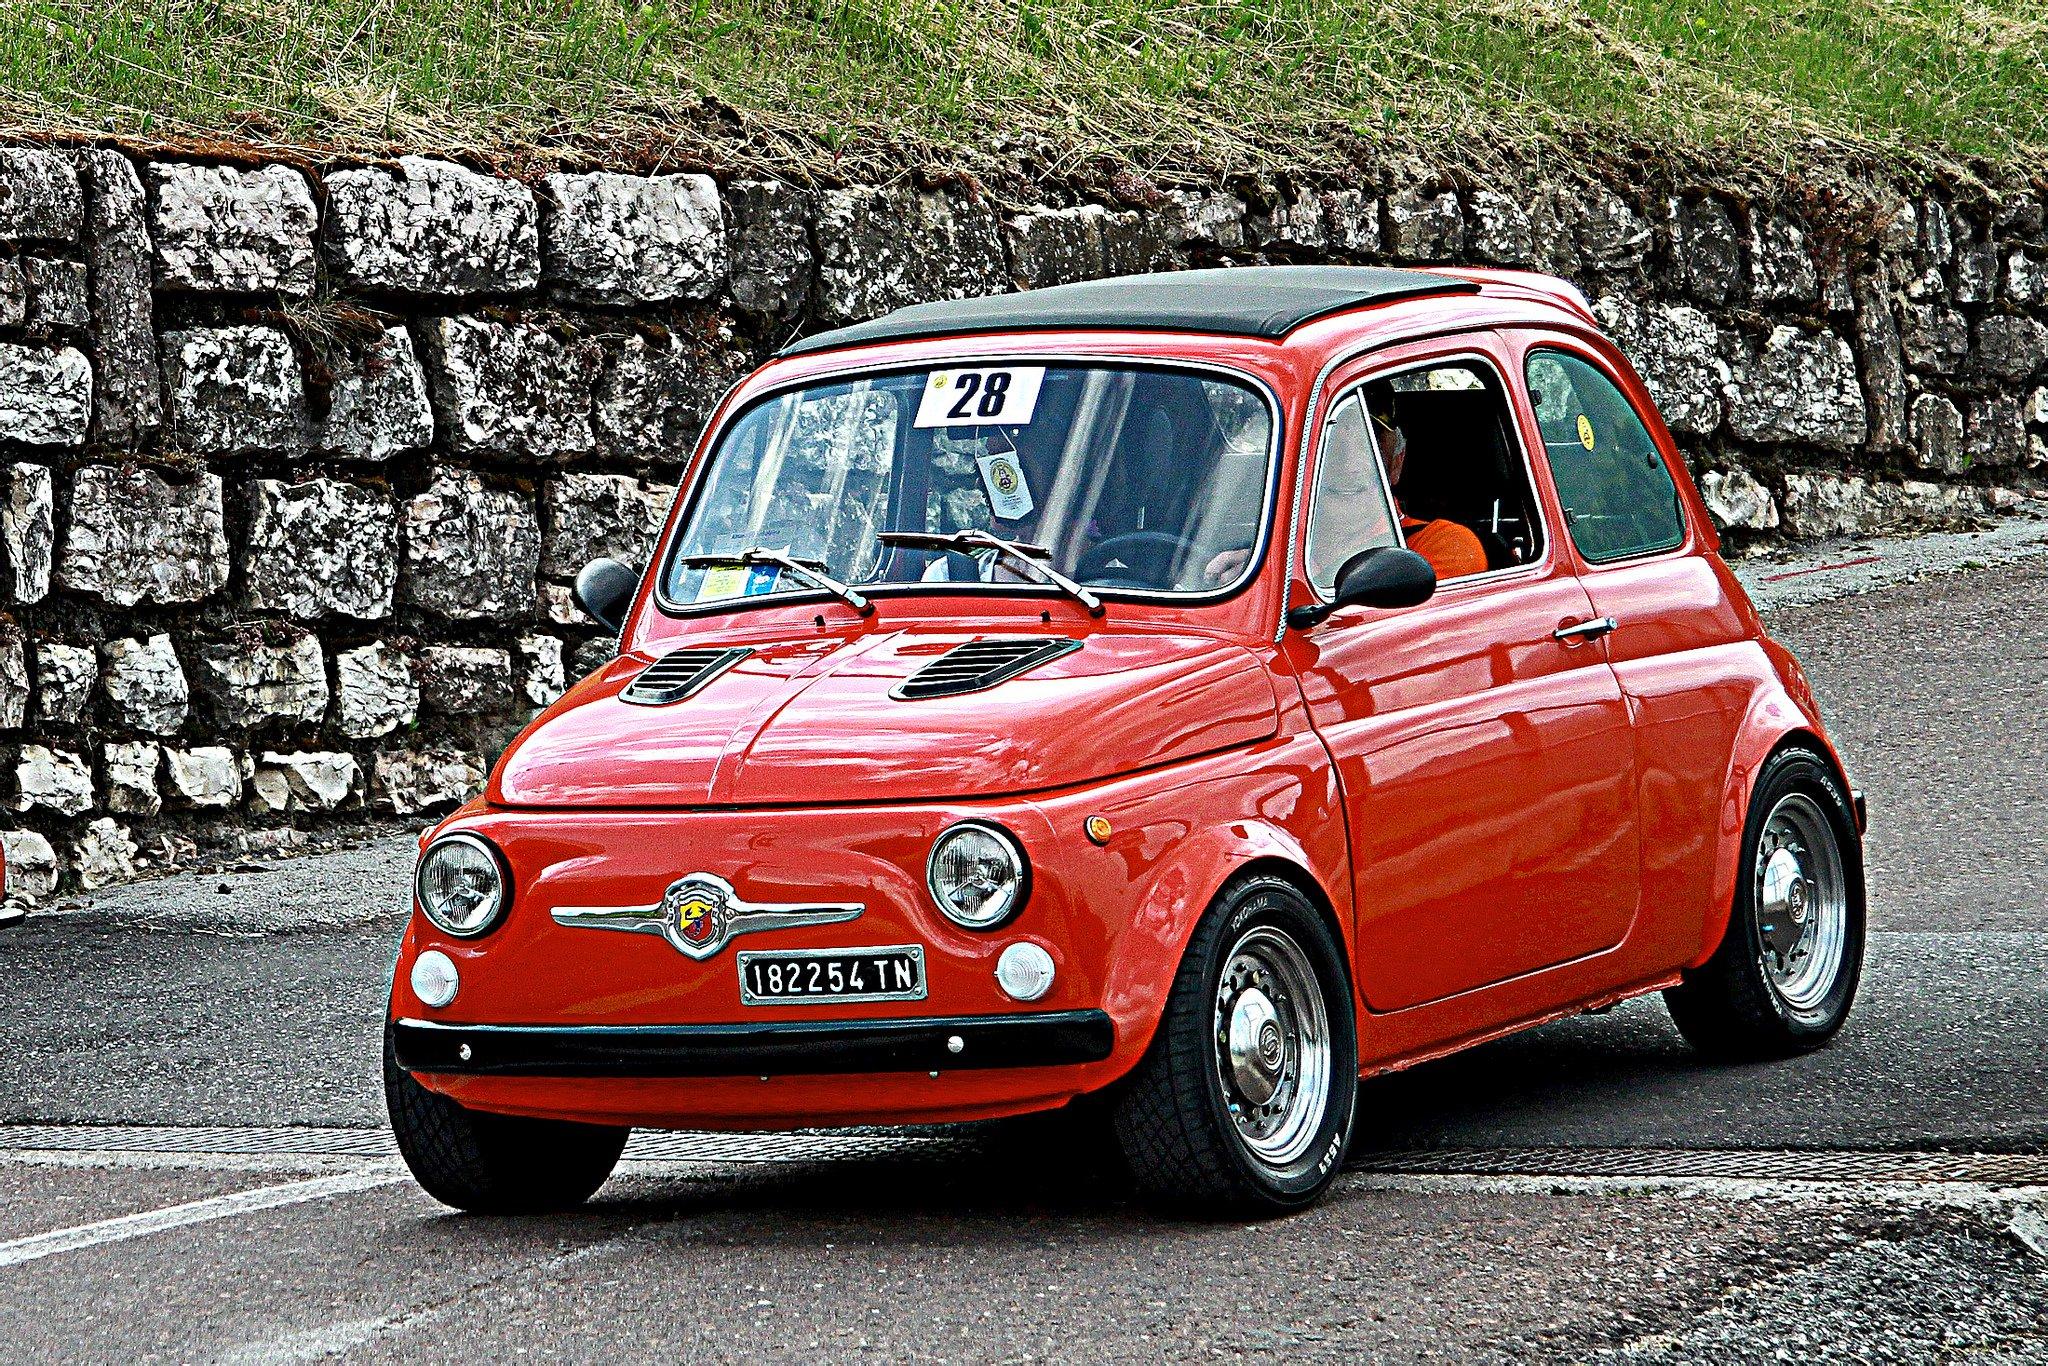 fiat cinquecento 500 595 abarth mk1 cars classic italia italie wallpaper 2048x1366 603085. Black Bedroom Furniture Sets. Home Design Ideas